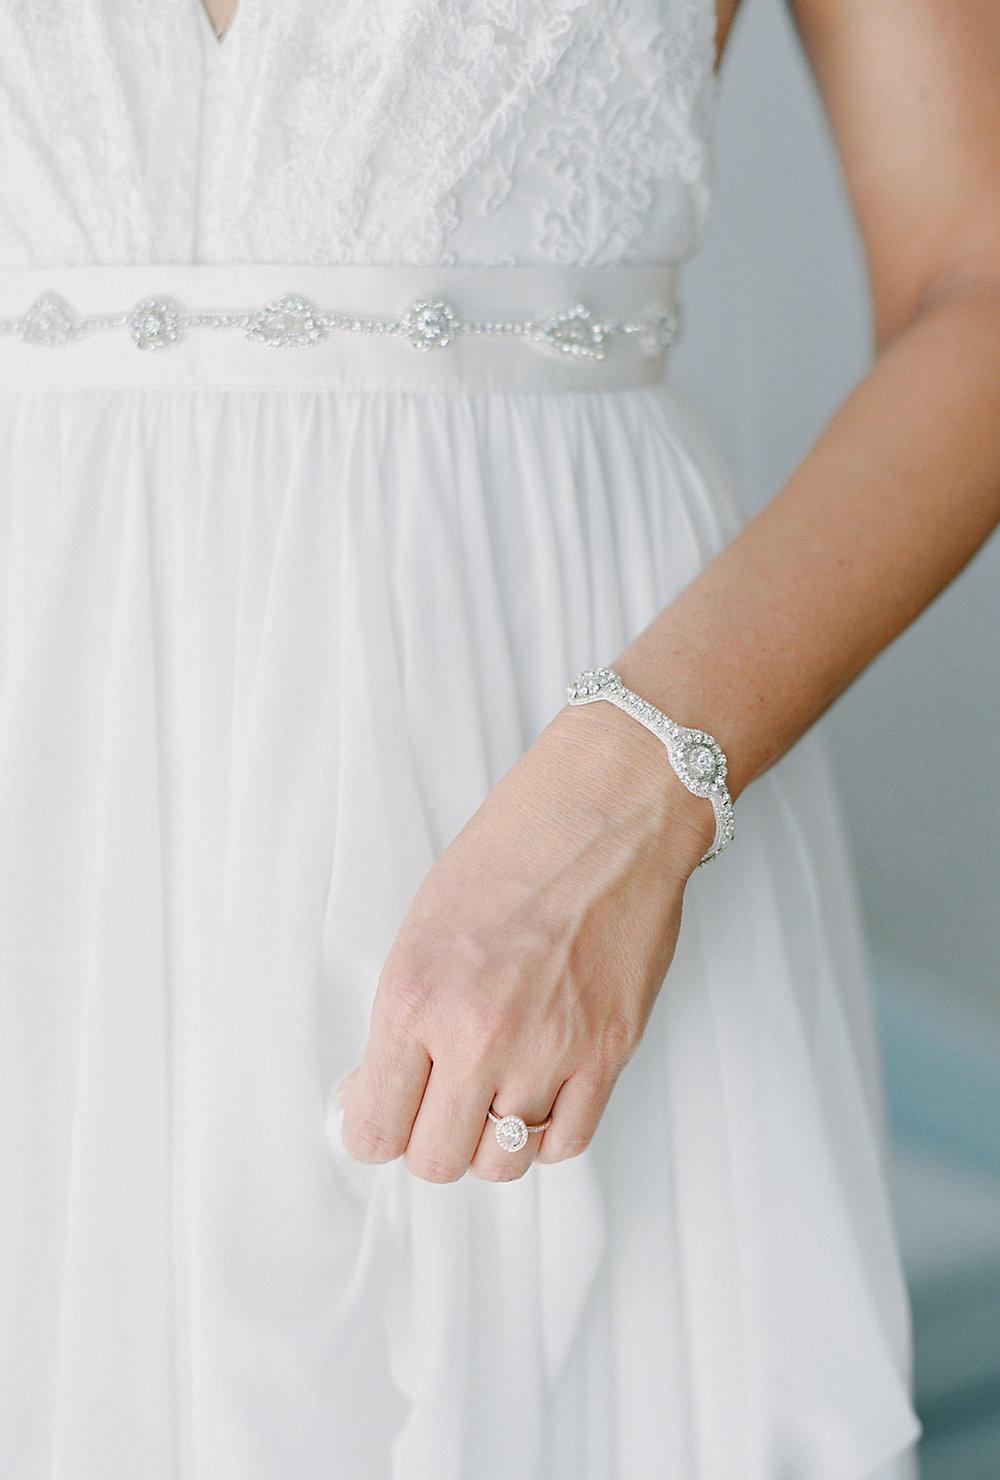 nestina-accessories-lookbook-002.jpg